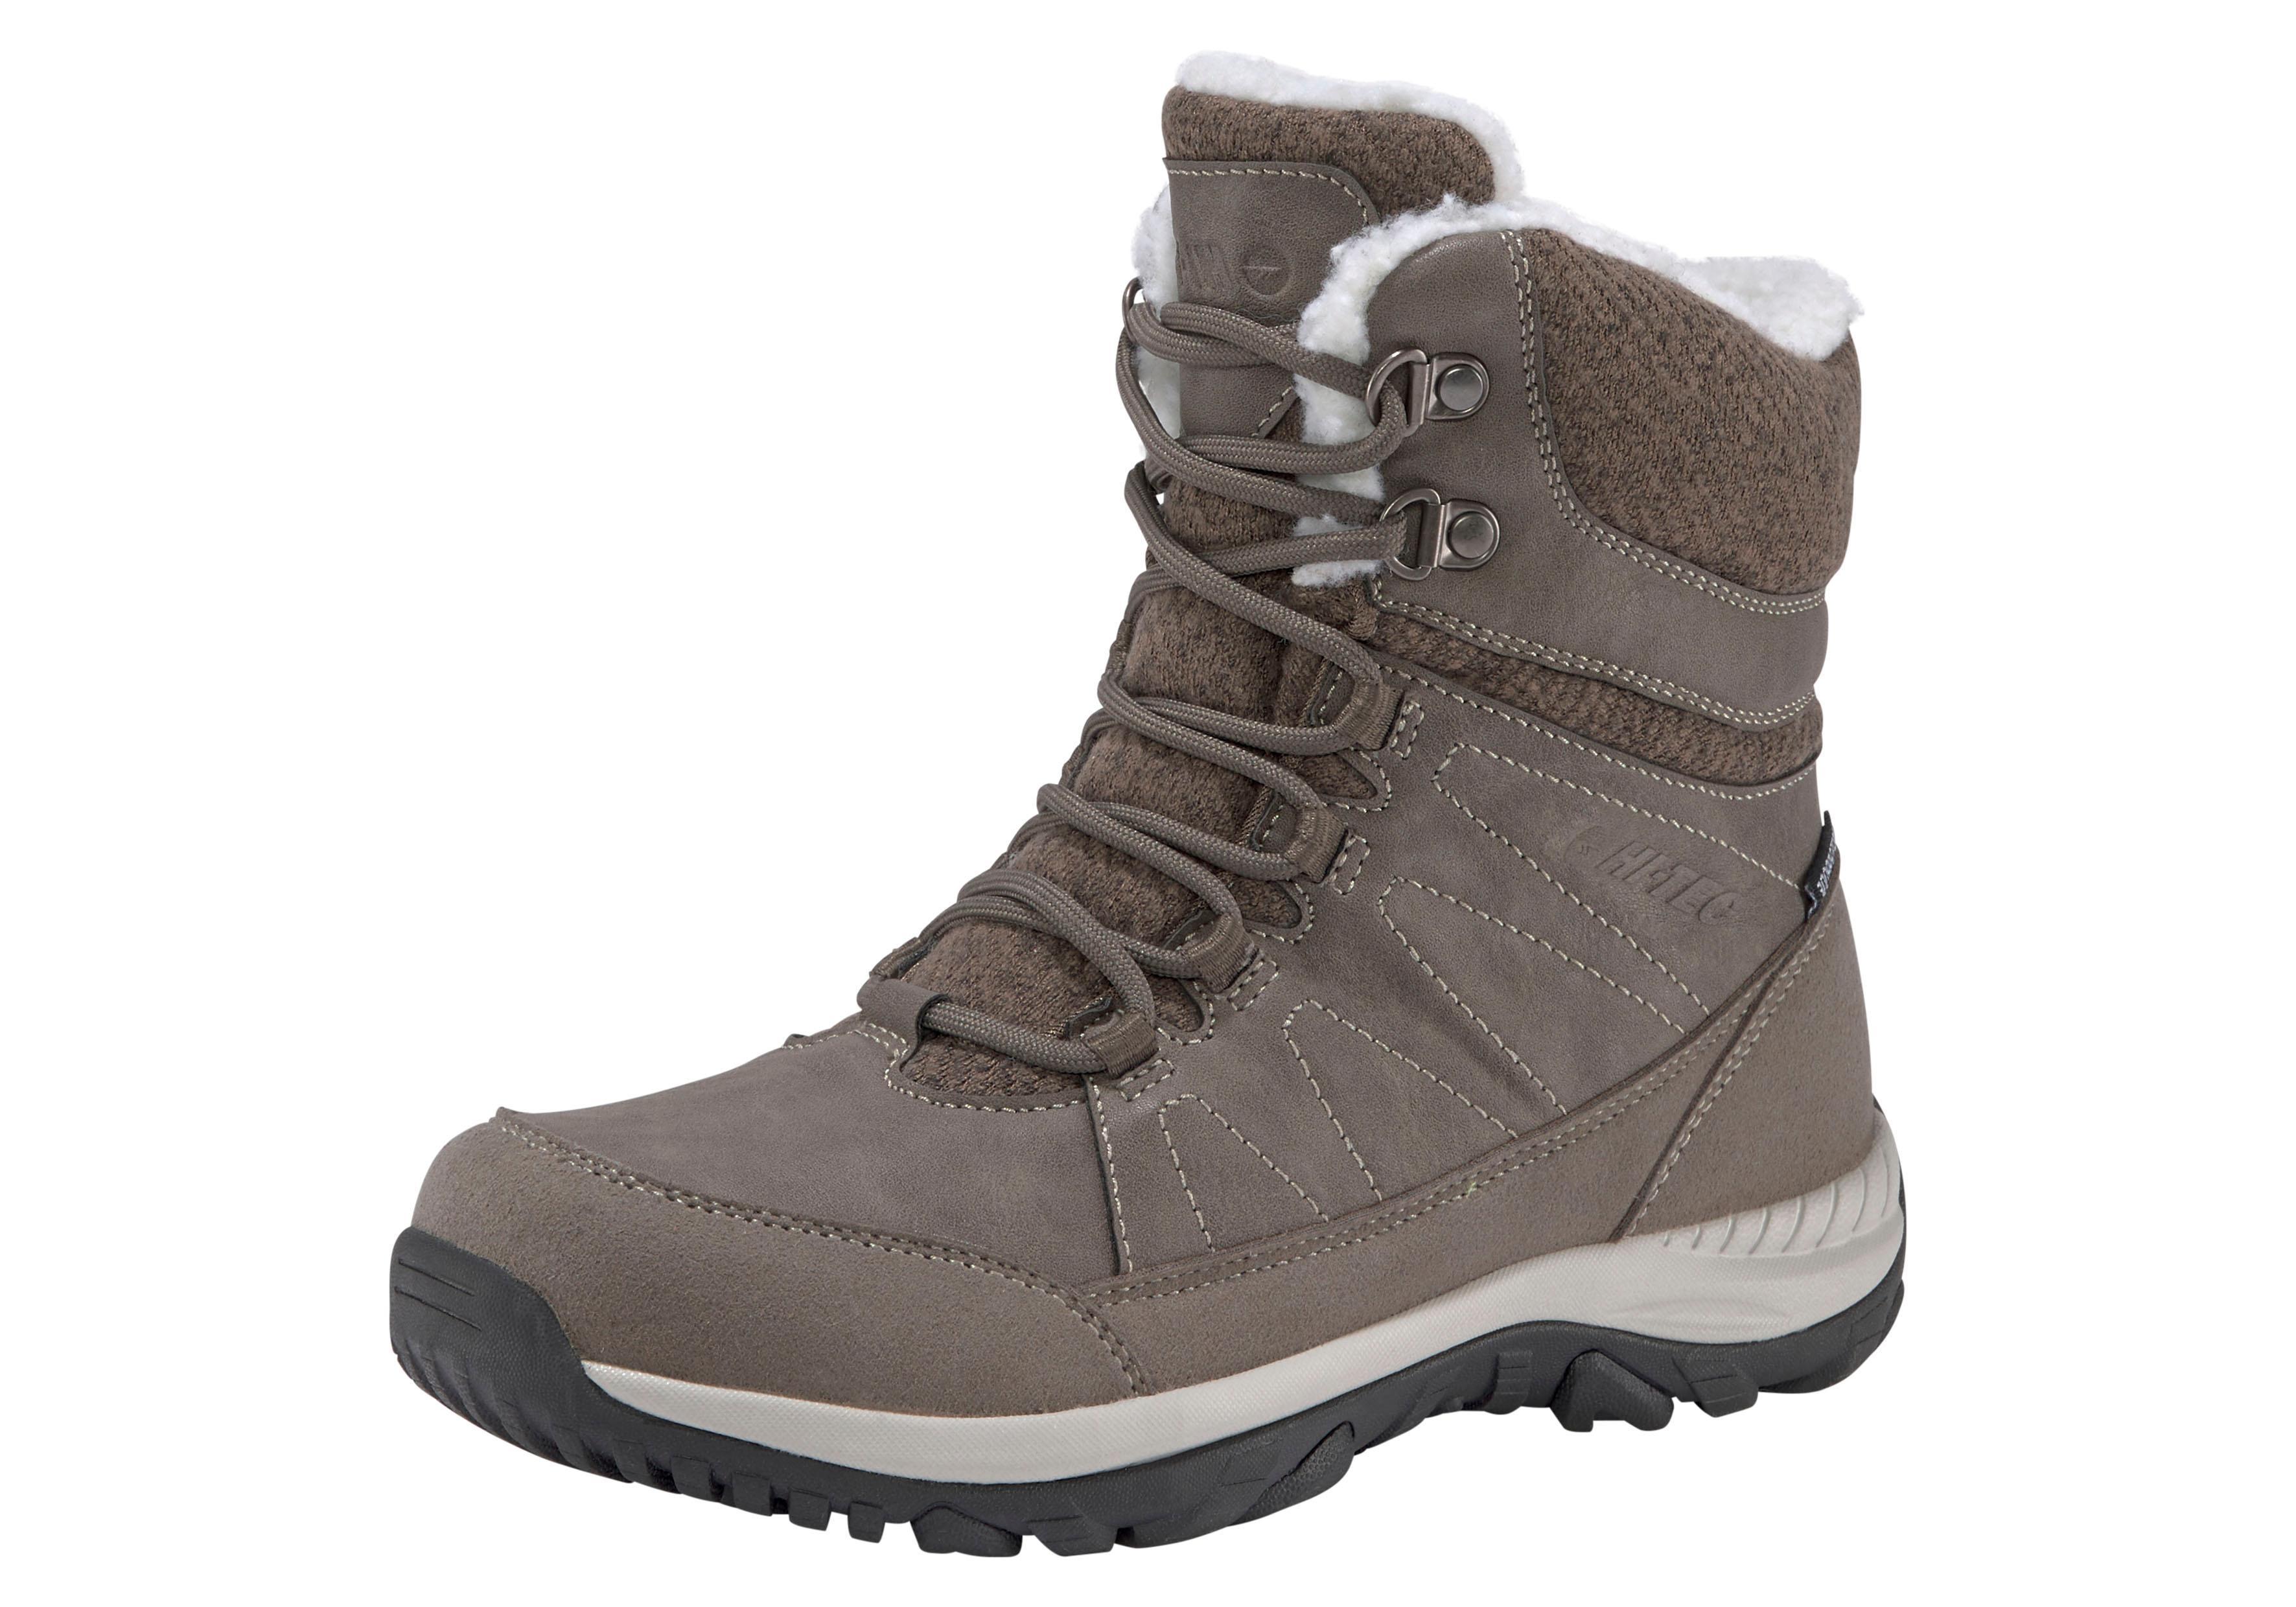 Hi-Tec Outdoorwinterstiefel RIVA MID WATERPROOF | Schuhe > Outdoorschuhe > Outdoorwinterstiefel | Hi-Tec